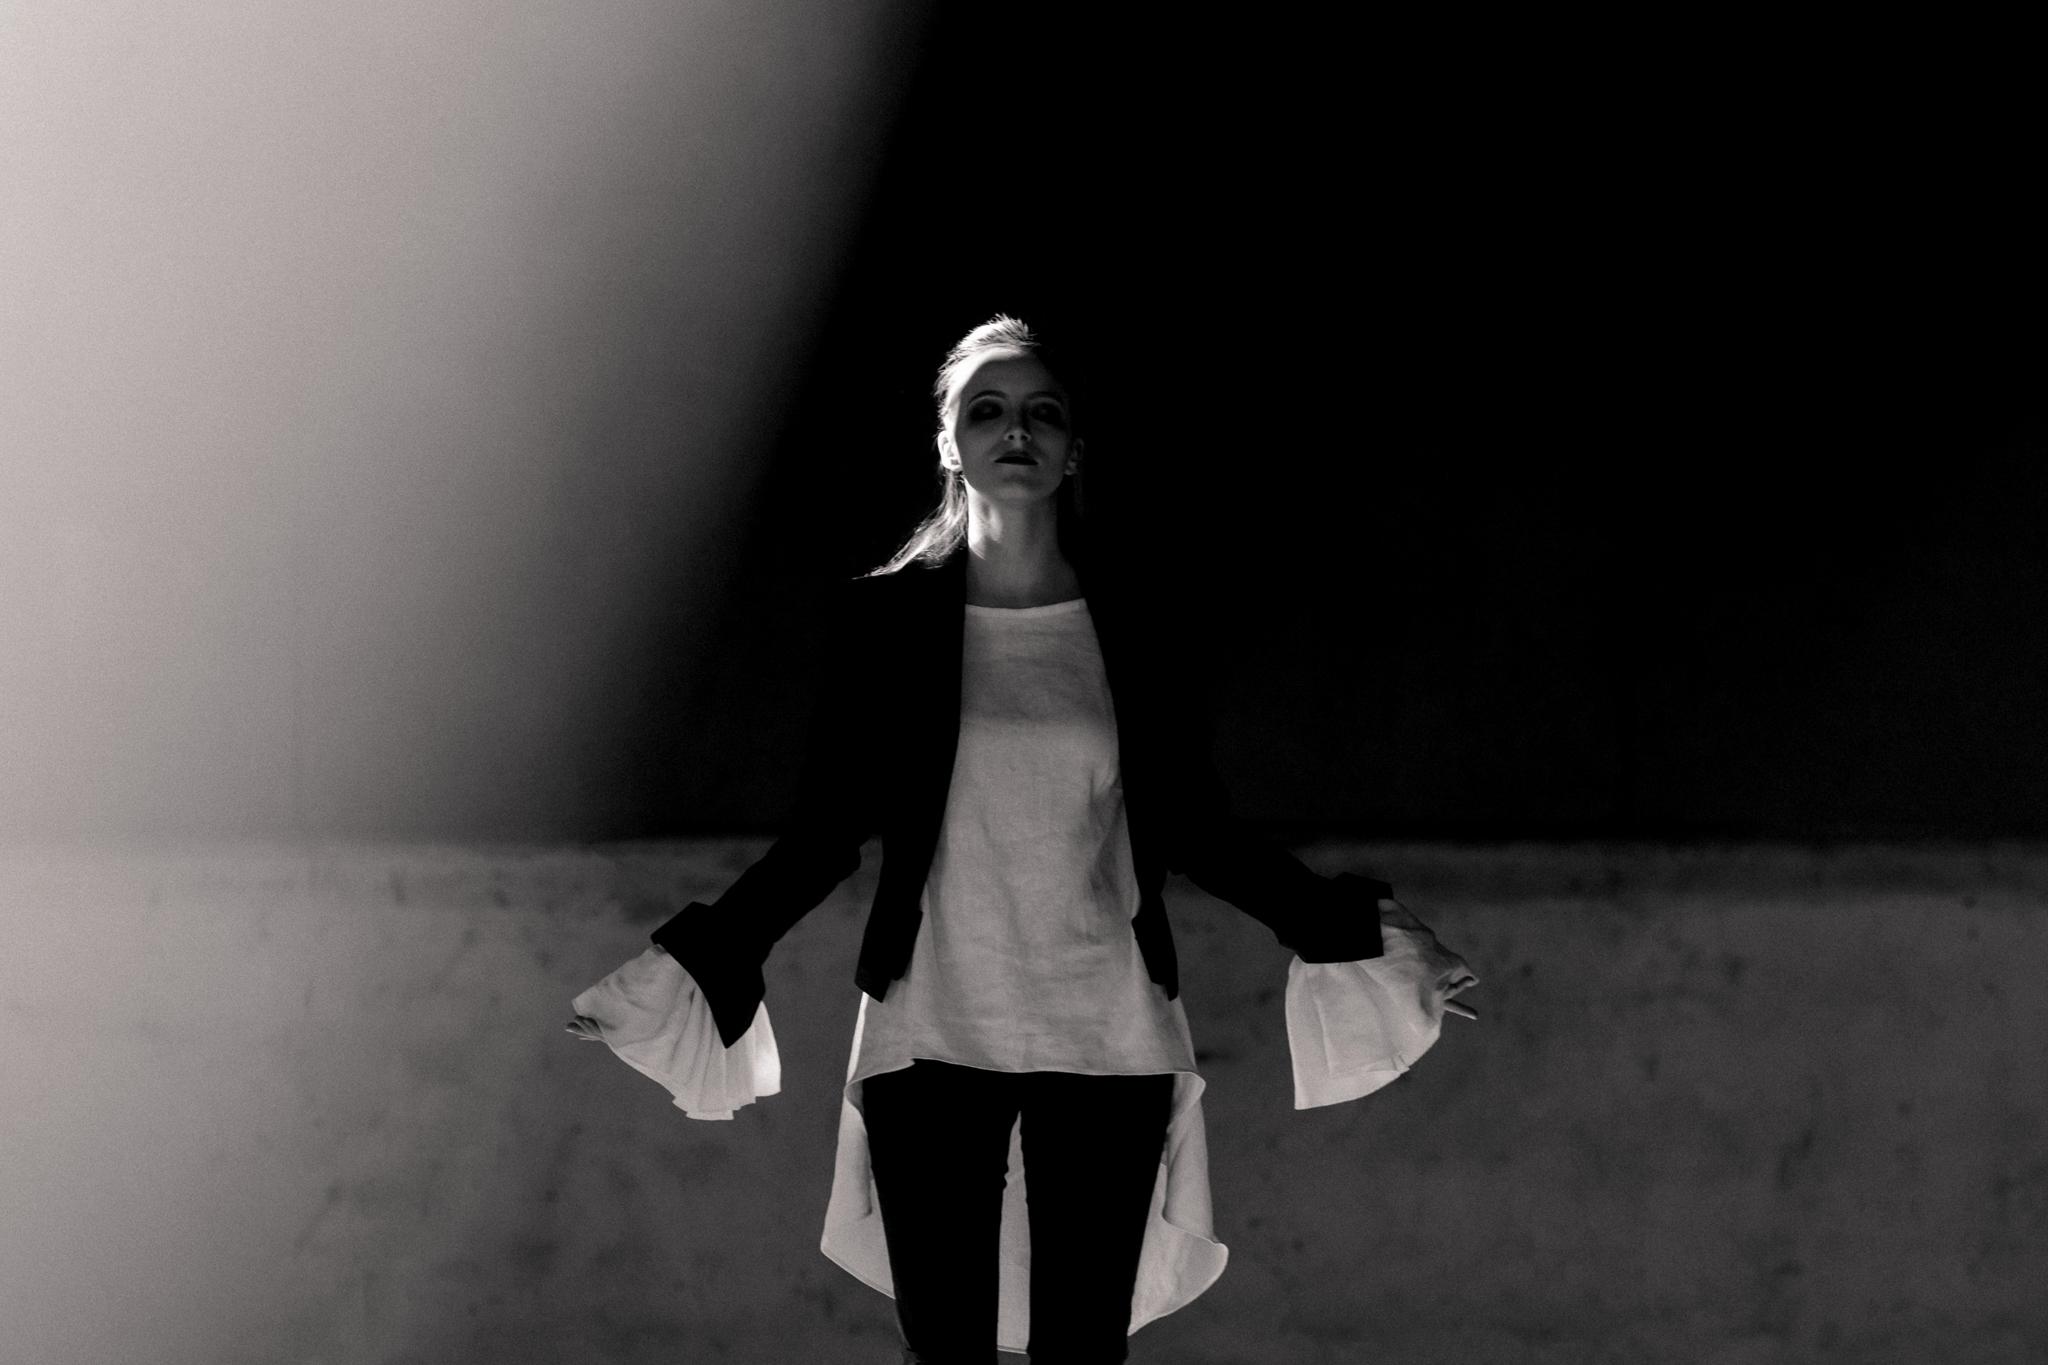 Bowie Tribute Editorial-Blackstar-Eldridge_Edit_Anna_E_Cottrell_Styling_Fashion Blogger_ MGB_Photo_11.jpg